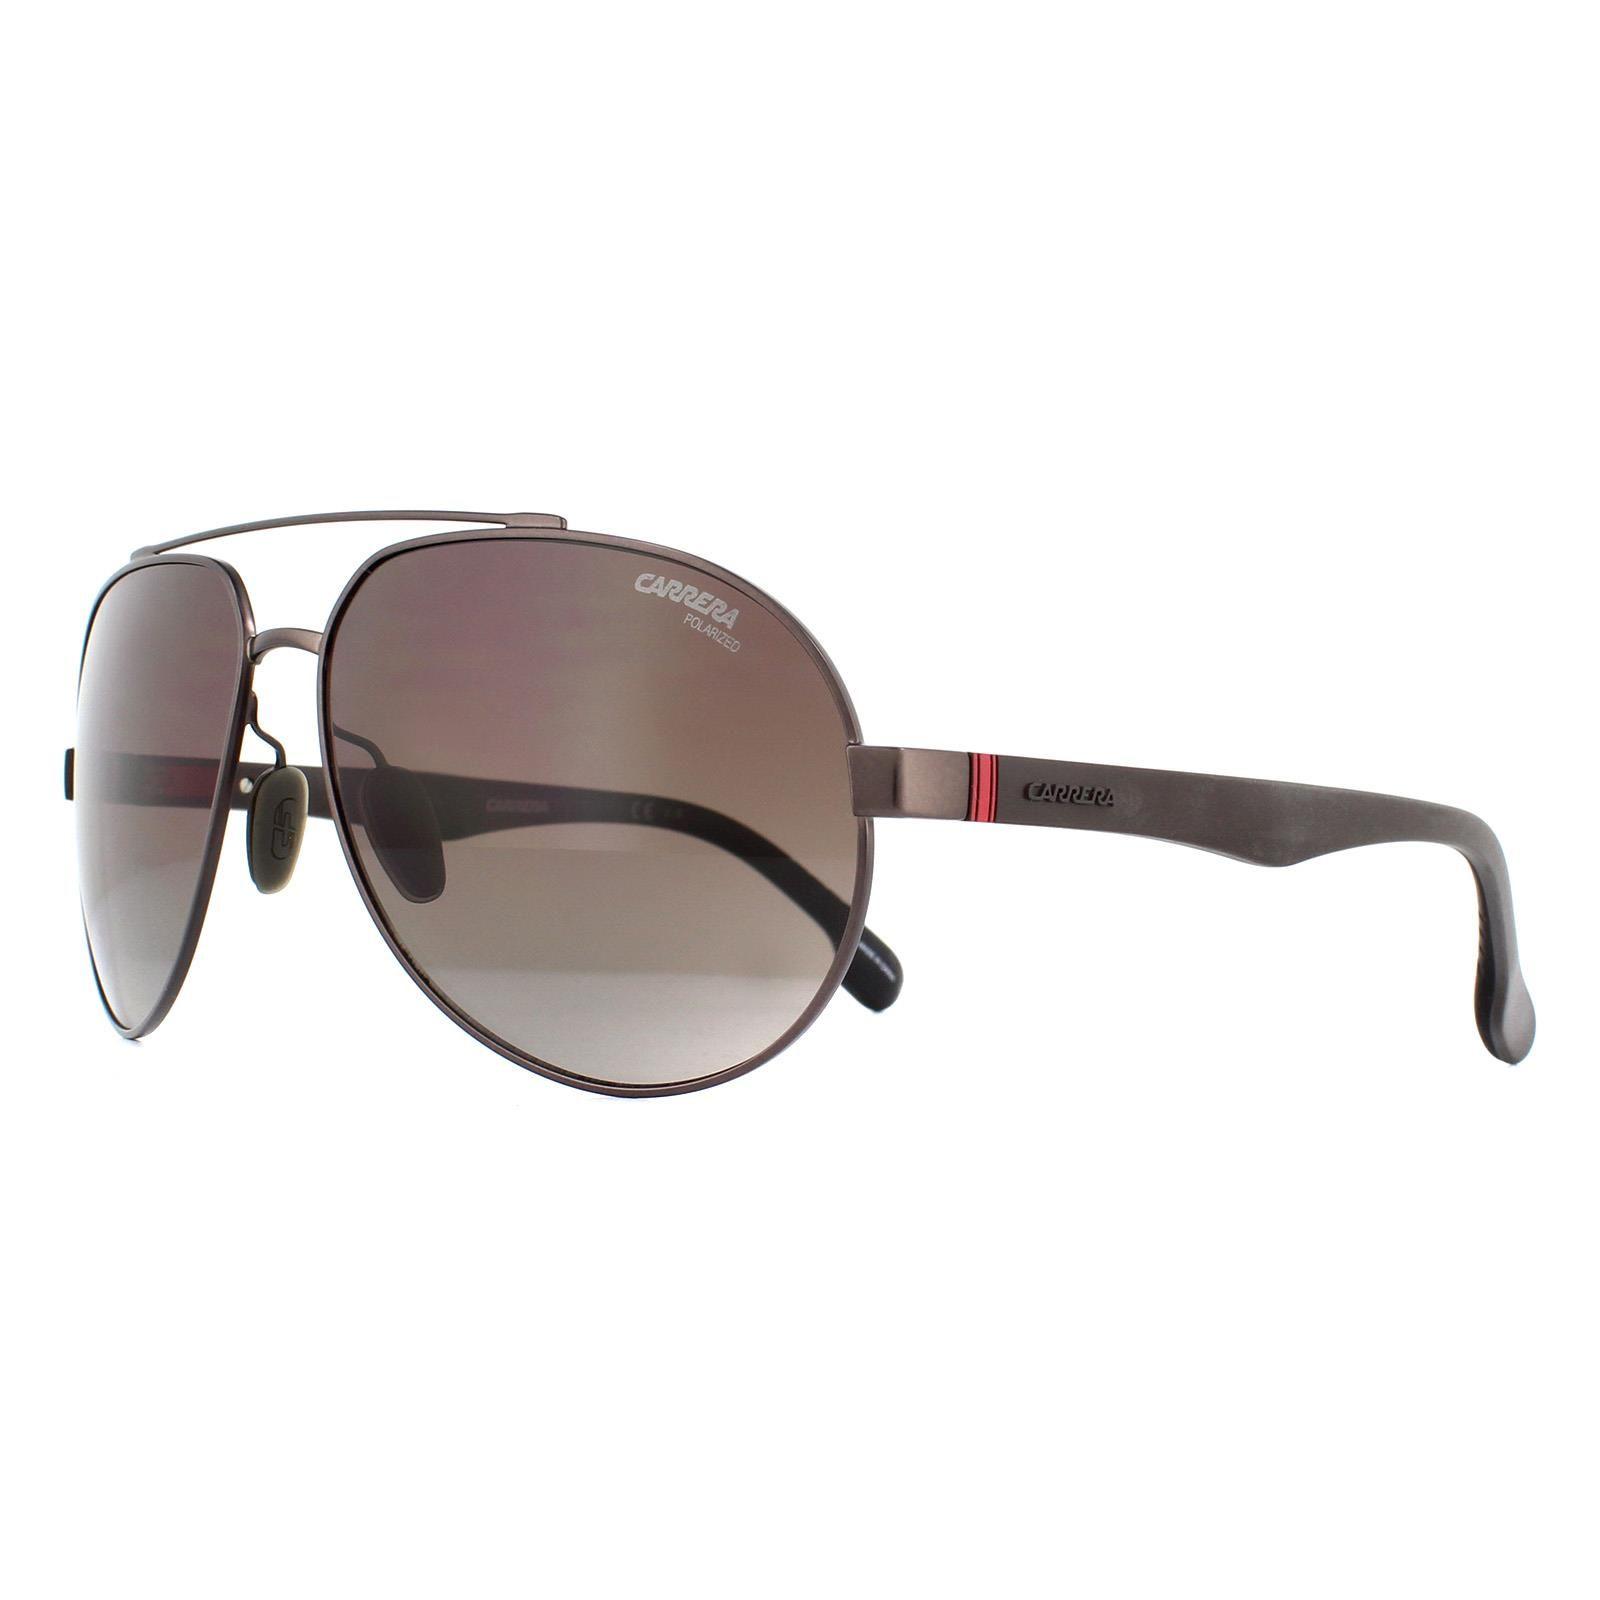 Carrera Sunglasses 8025/S YZ4 Matte Brown Brown Gradient